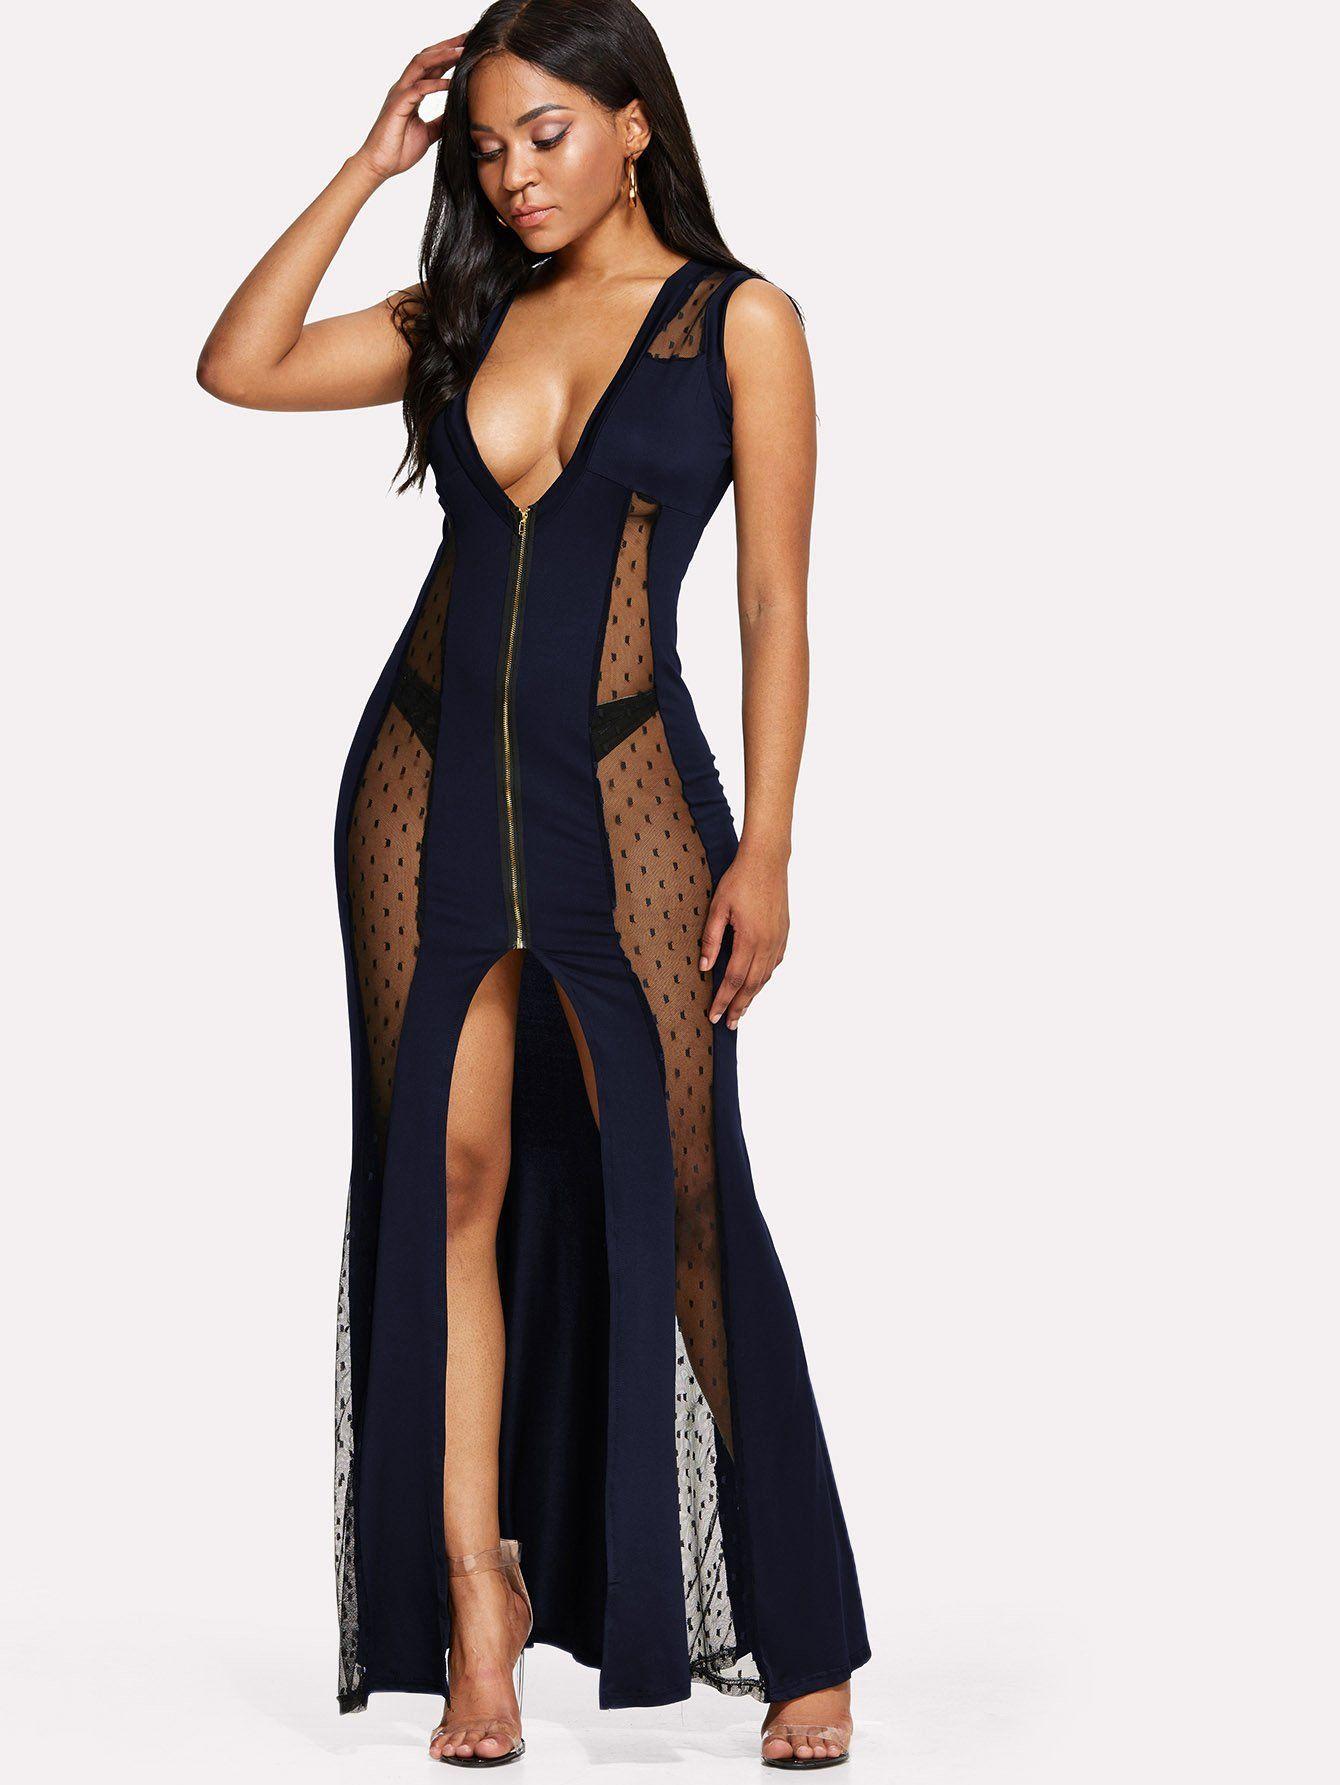 Contrast mesh split dress in fashion pinterest fashion